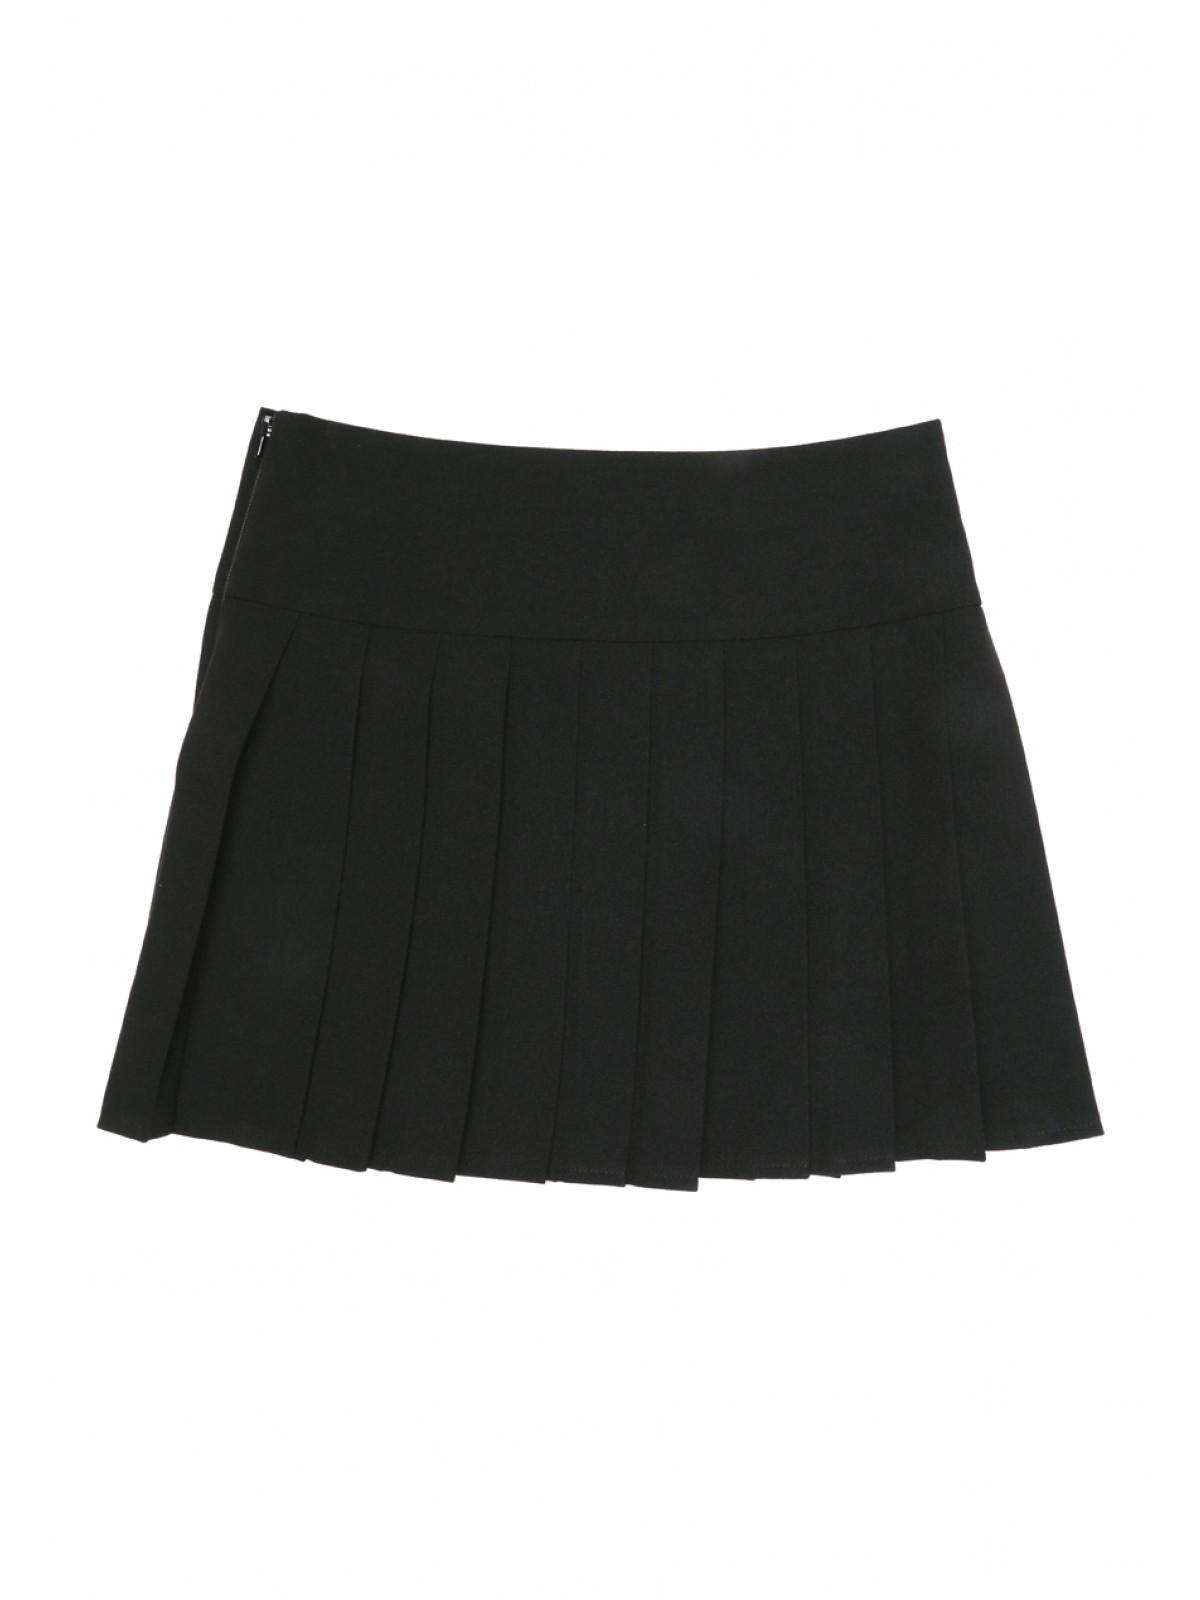 Girls Pleated School Skirt | Peacocks